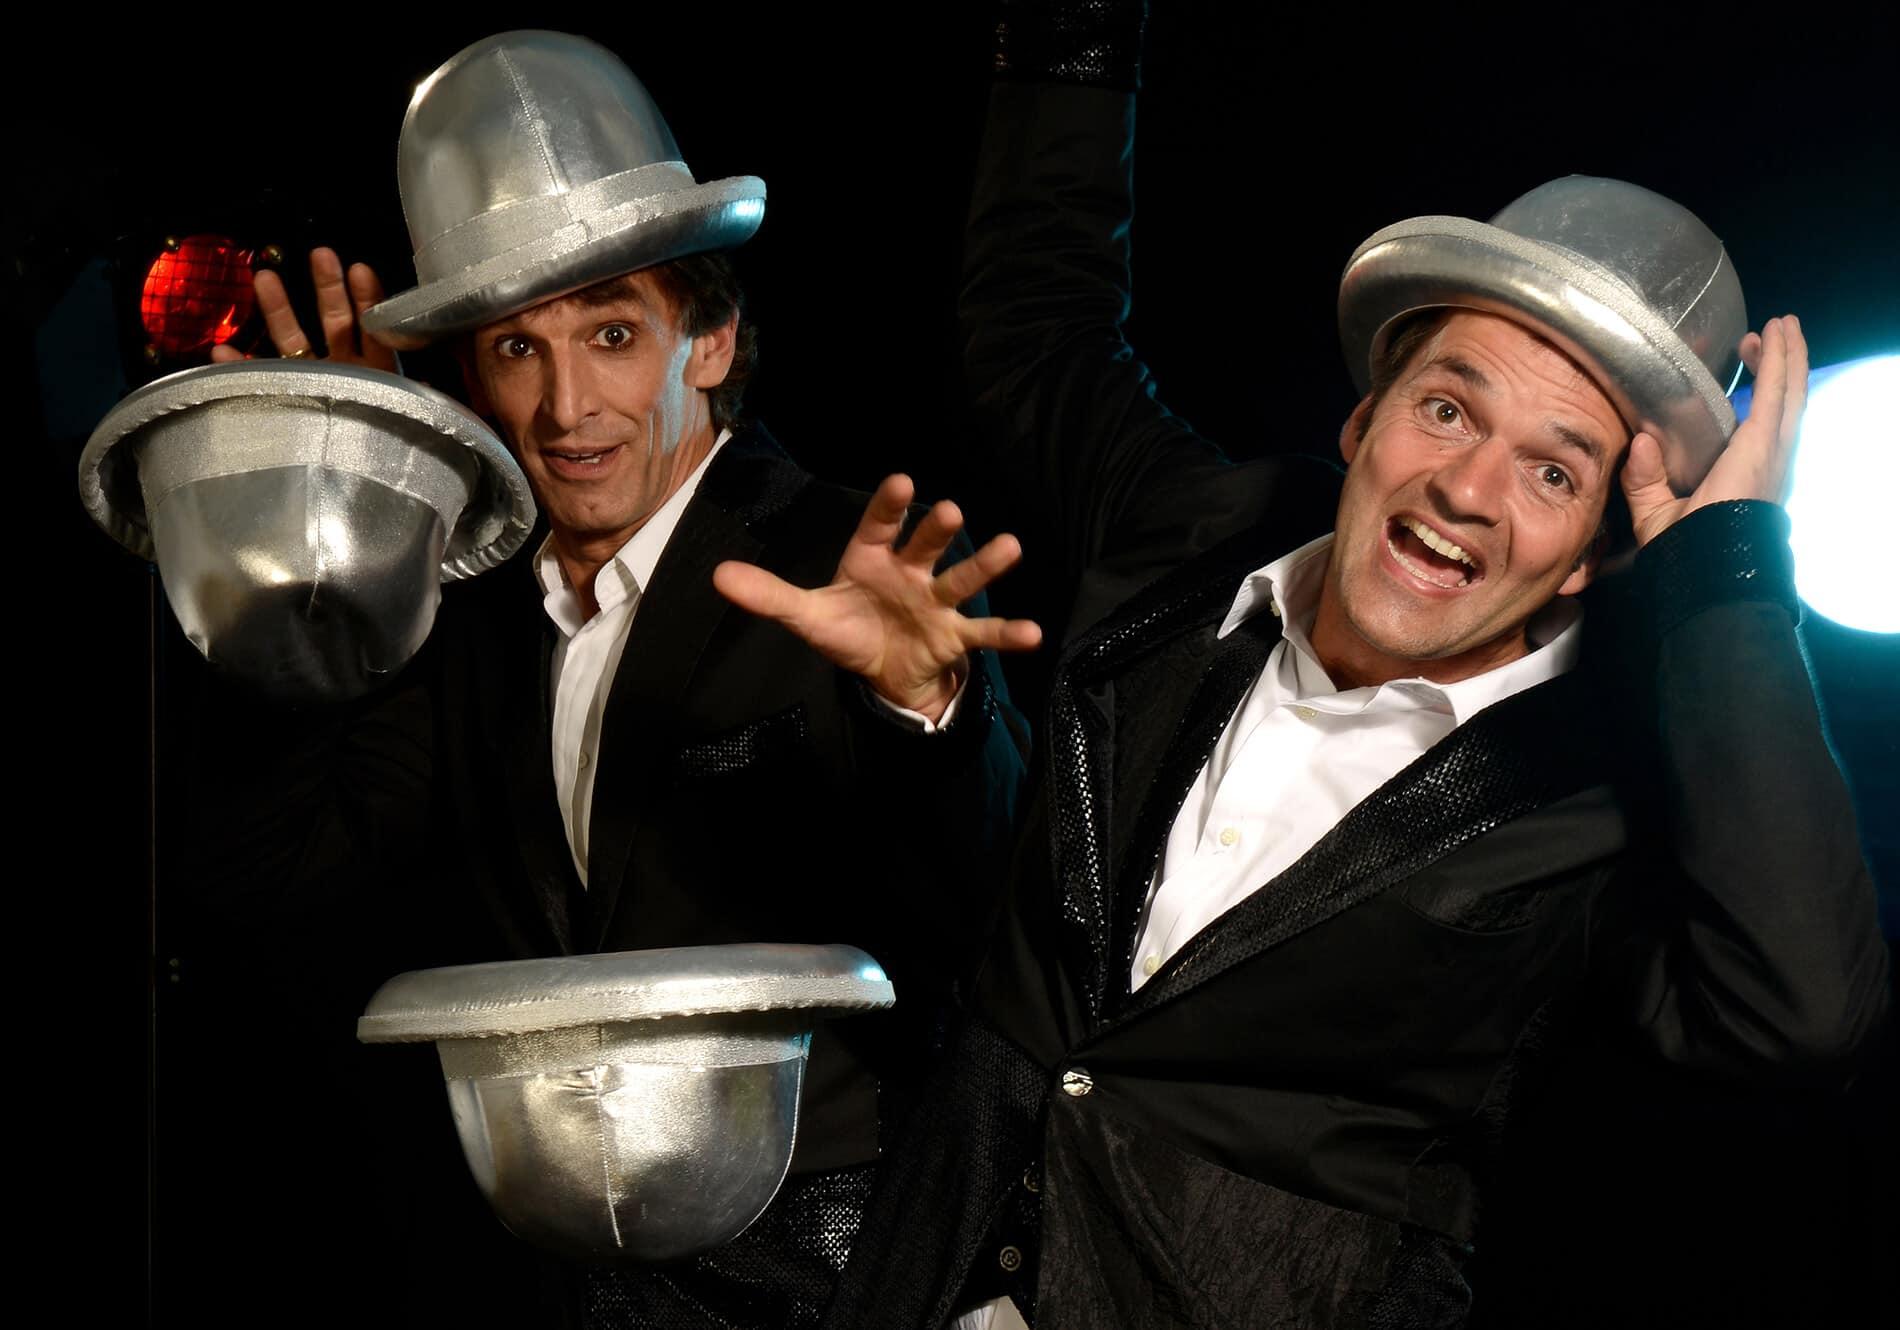 chapeau-bas-showact-artistik-und-comedy-10